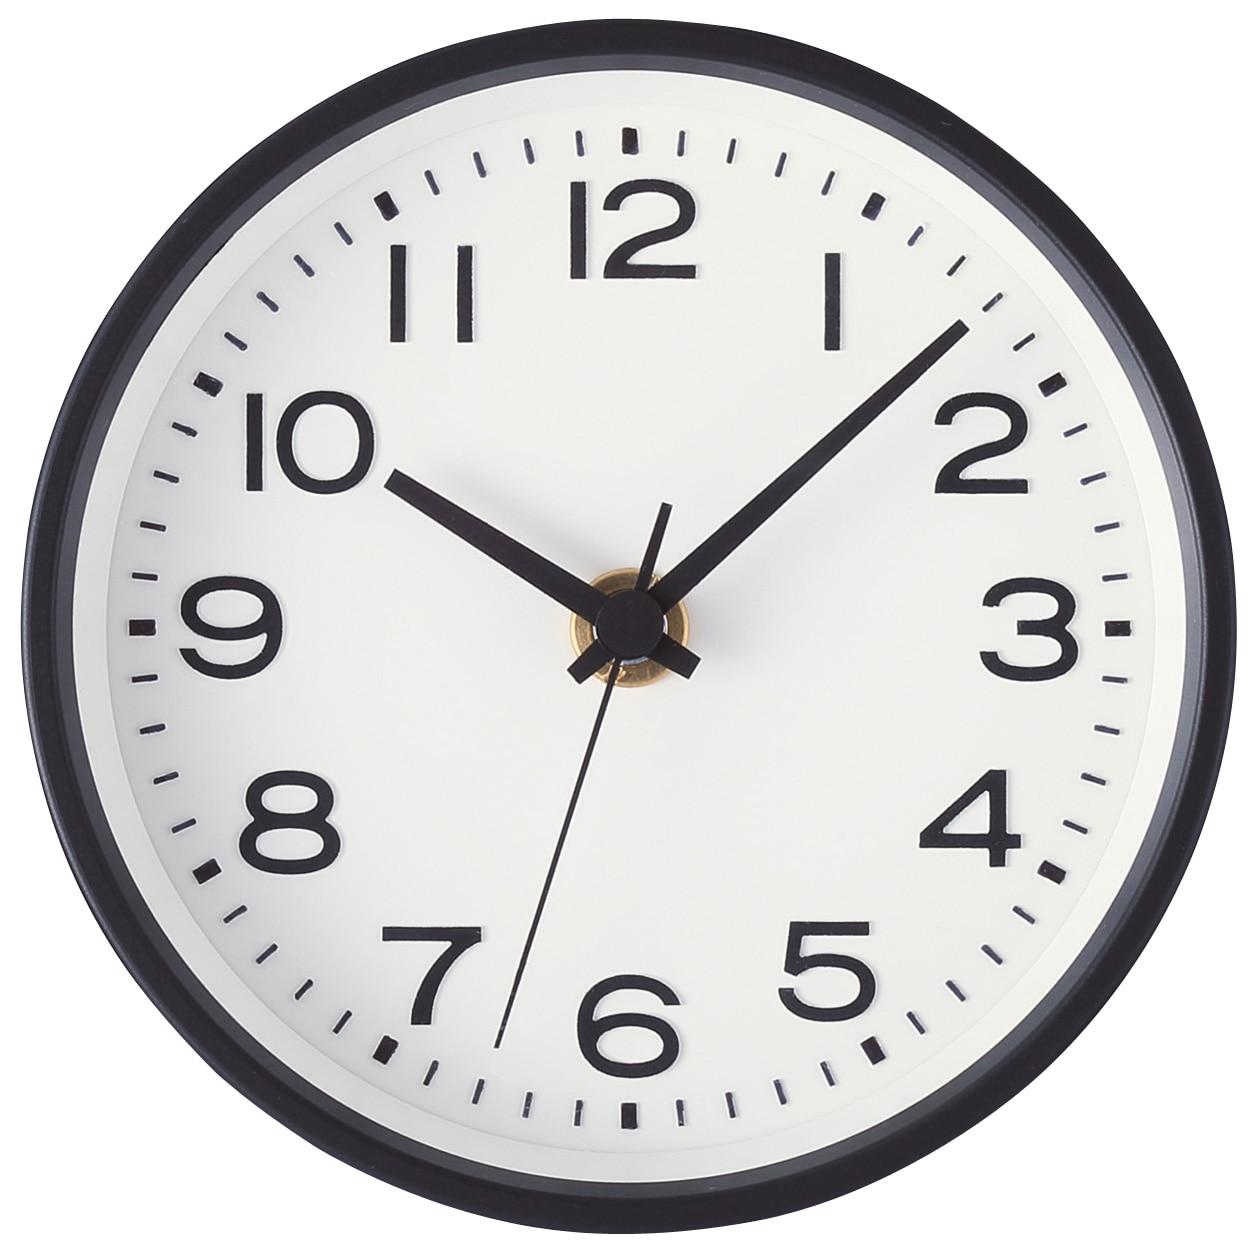 analog clock s with stand muji